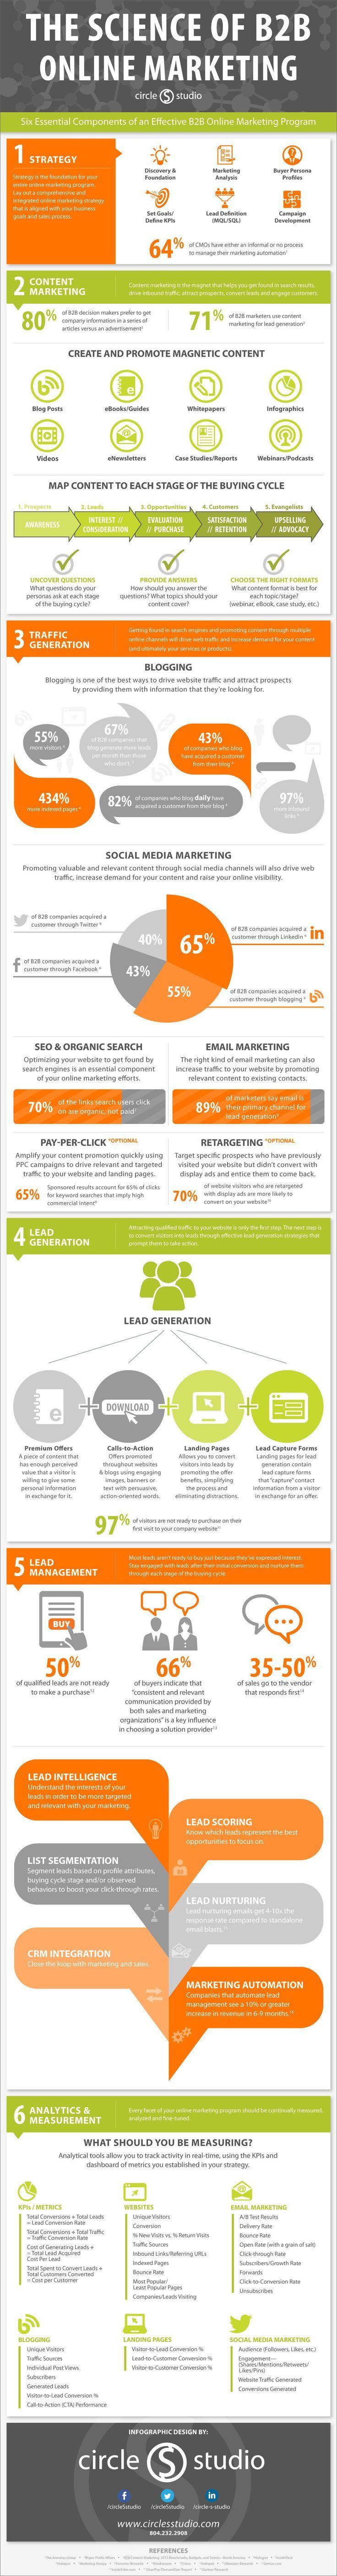 The Science of B2B Online Marketing - 6 Essential Component Of An Effective B2B Online Marketing Plan www.socialmediamamma.com Infographic